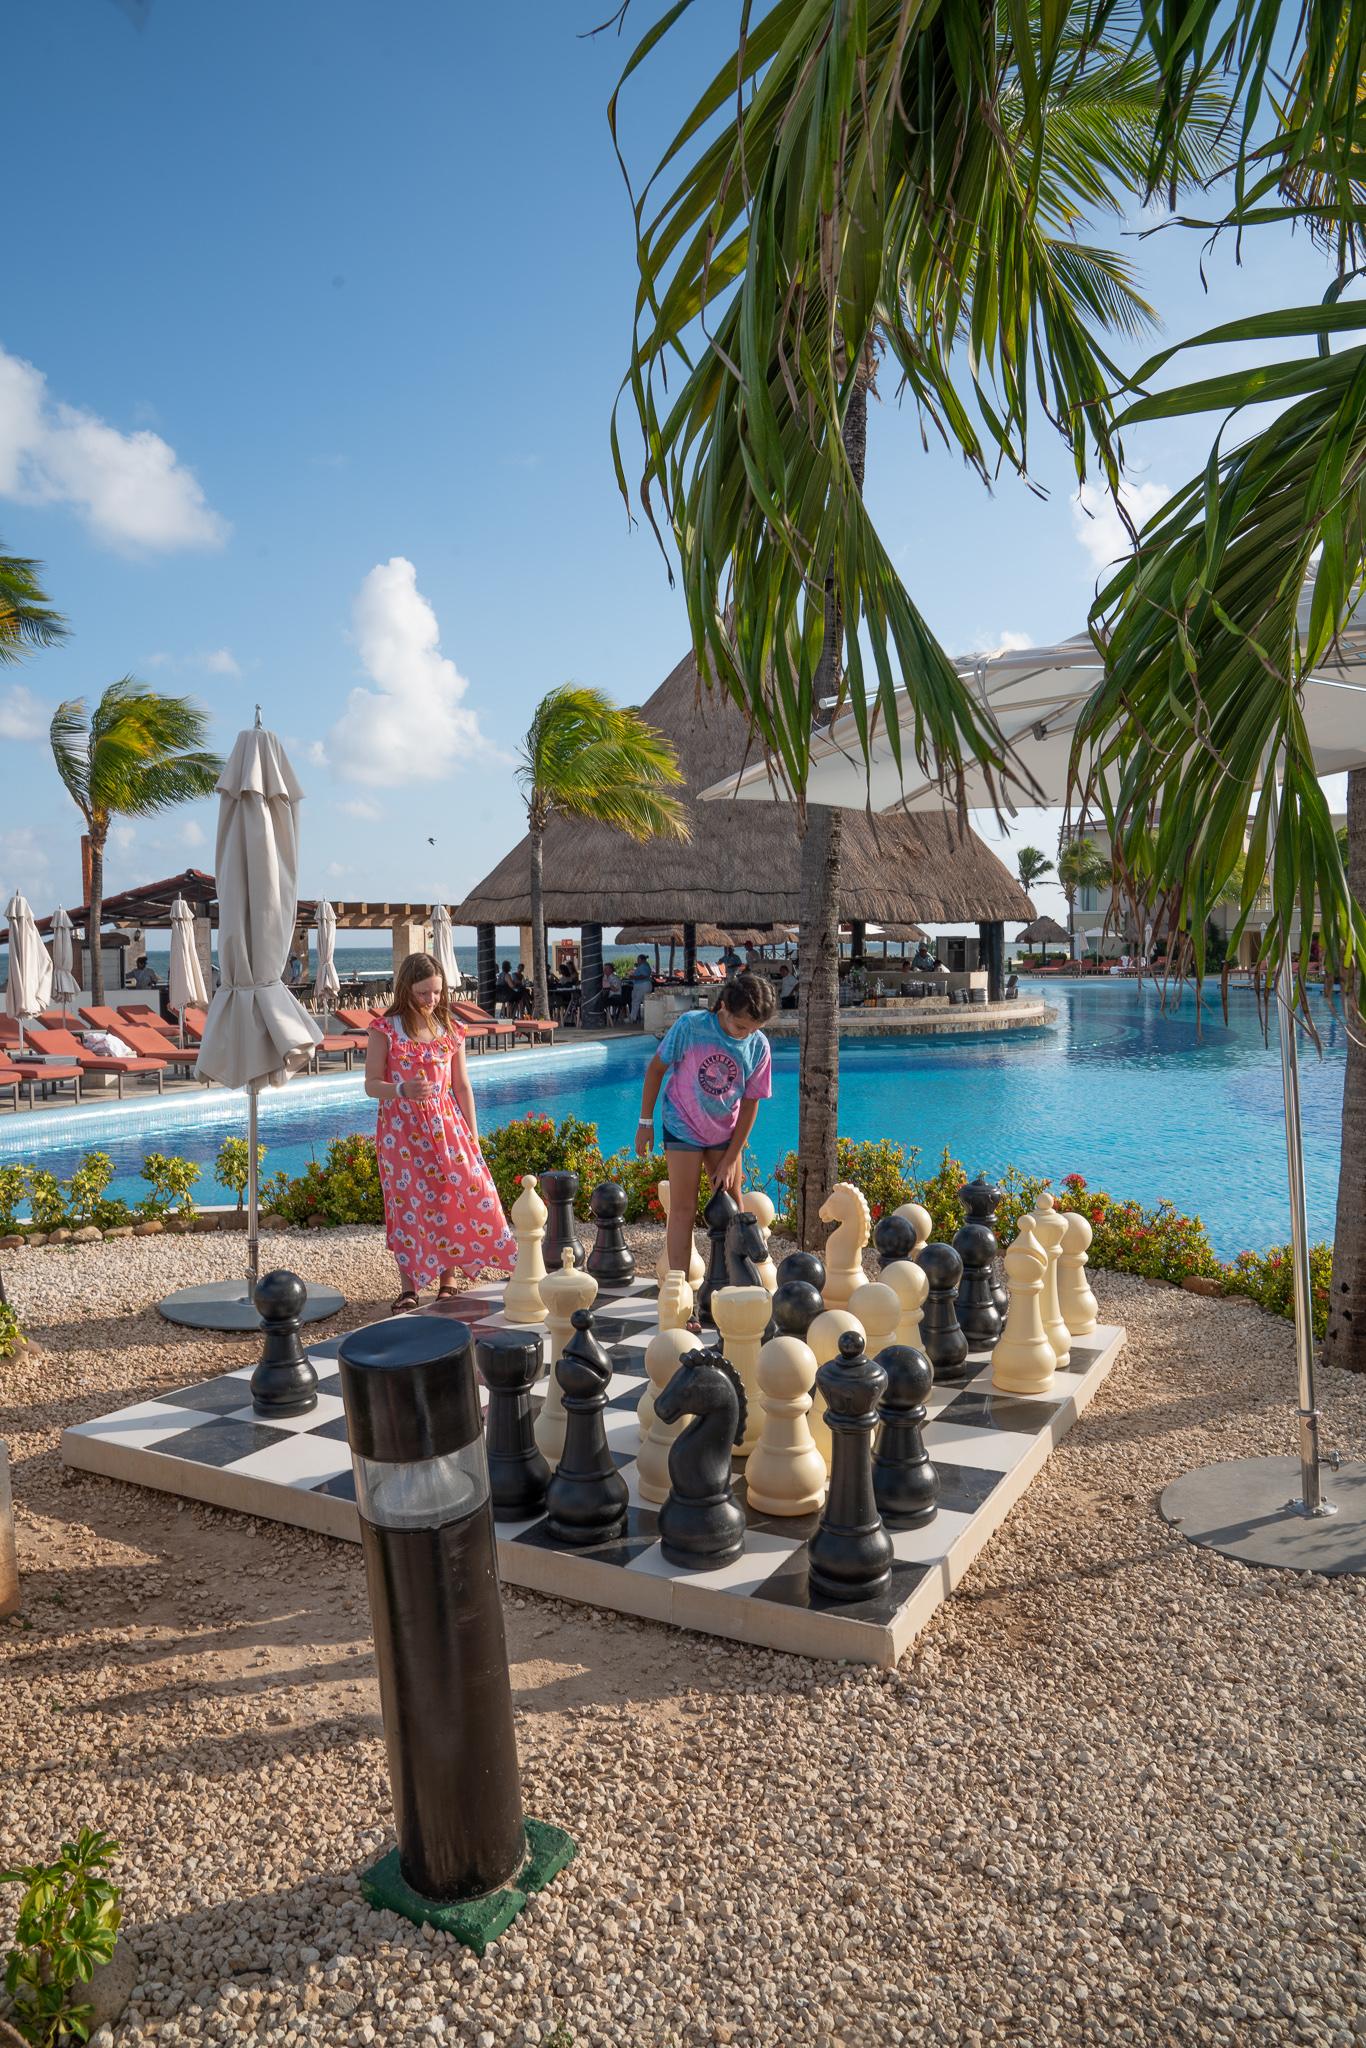 Life-size chess at the Grand at Moon Palace Cancun